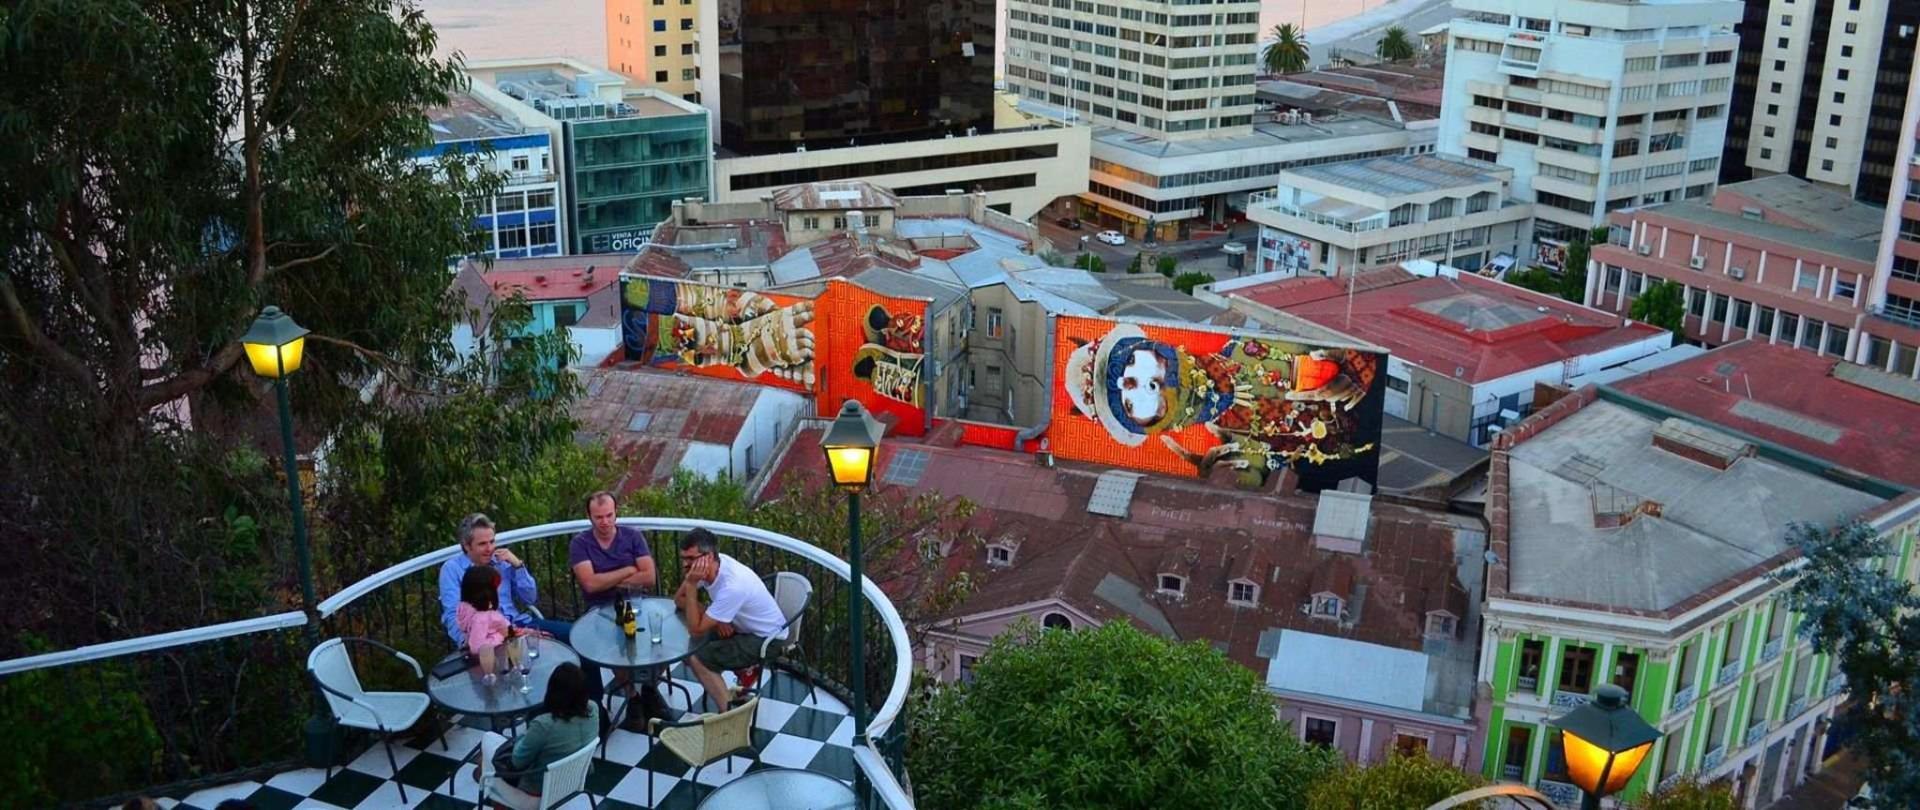 Interwetten casino mejores Valparaíso-987030